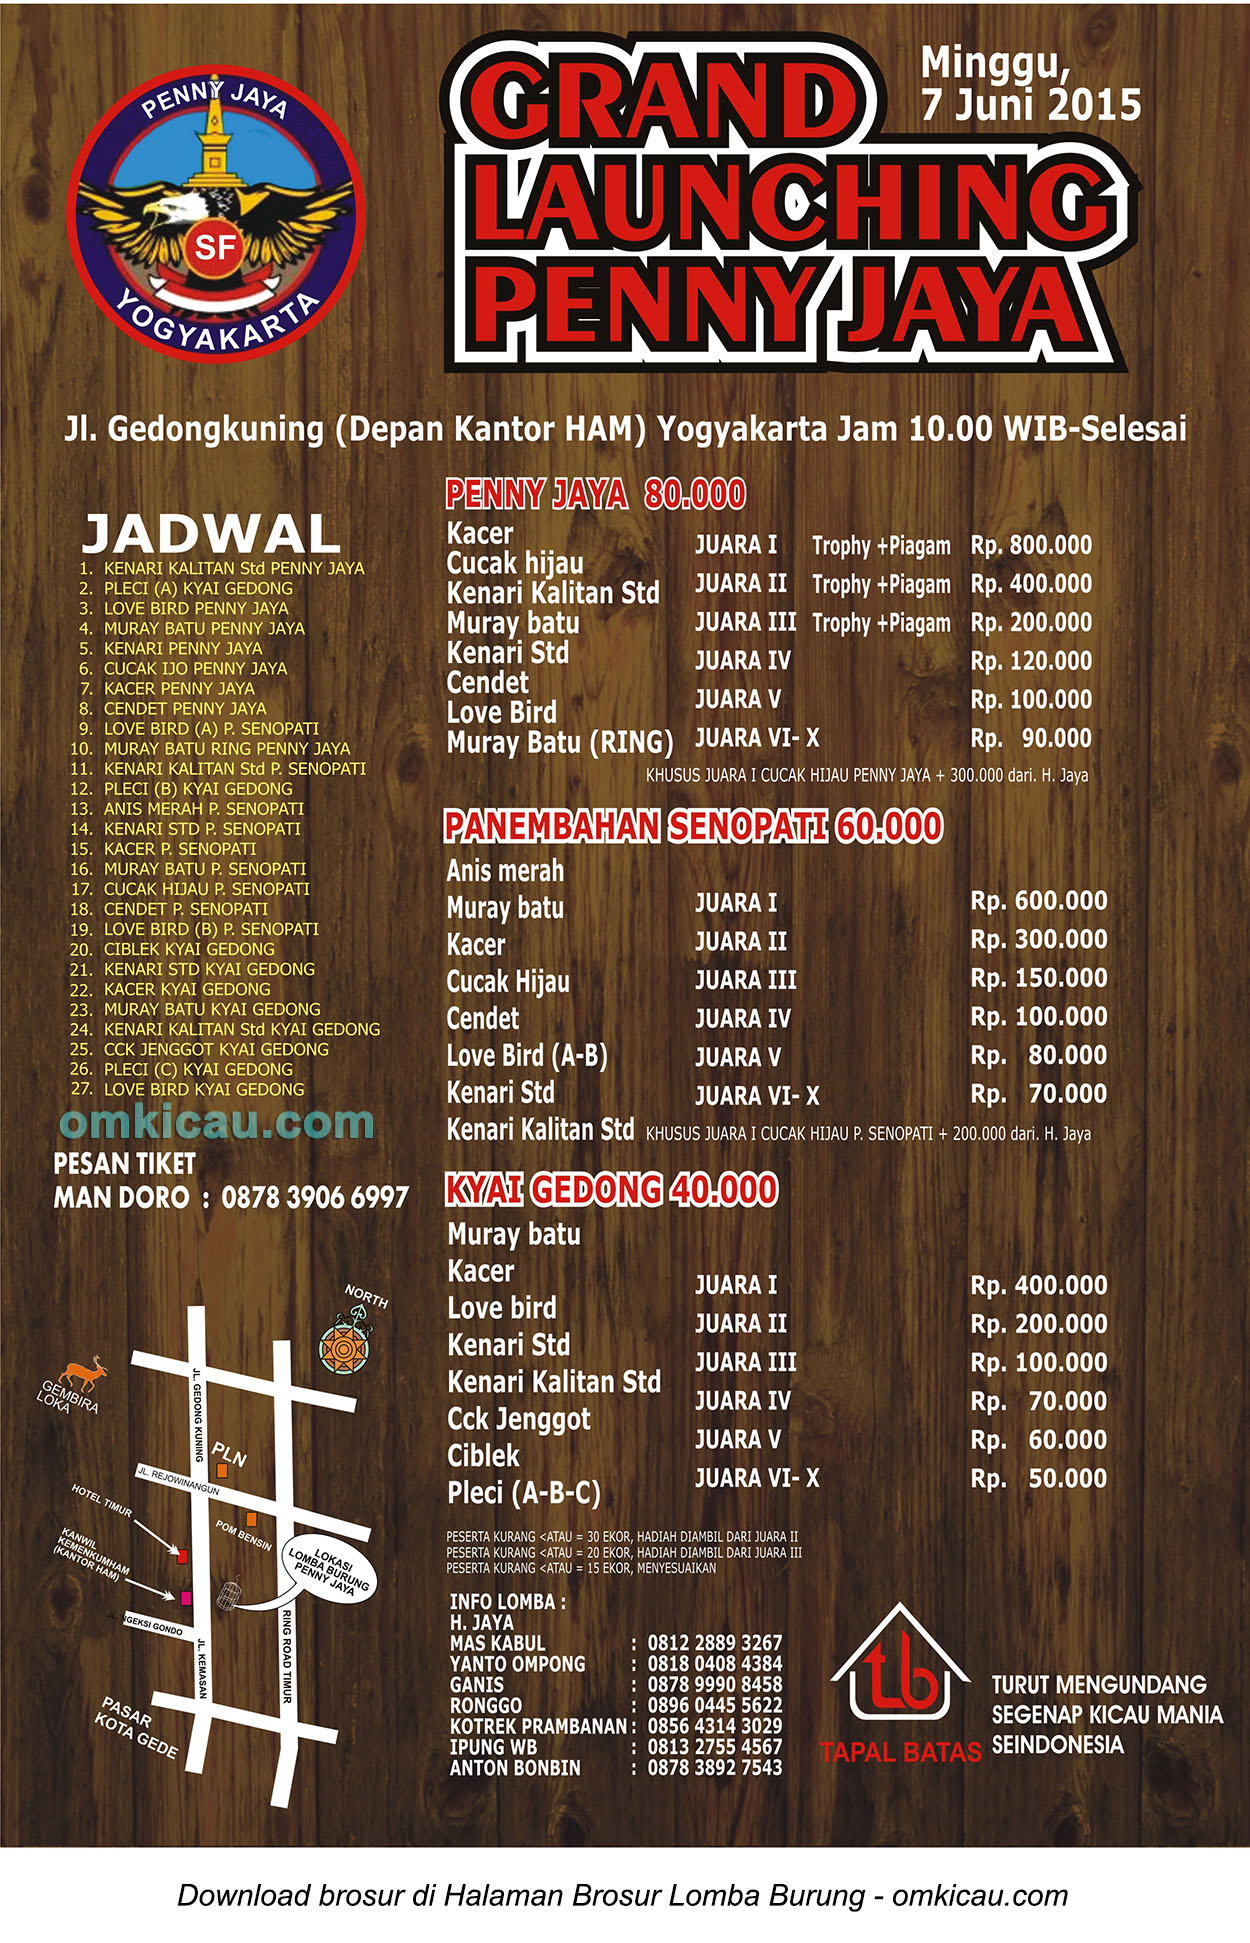 Brosur Lomba Burung Berkicau Grand Launching Penny Jaya, Jogja, 7 Juni 2015